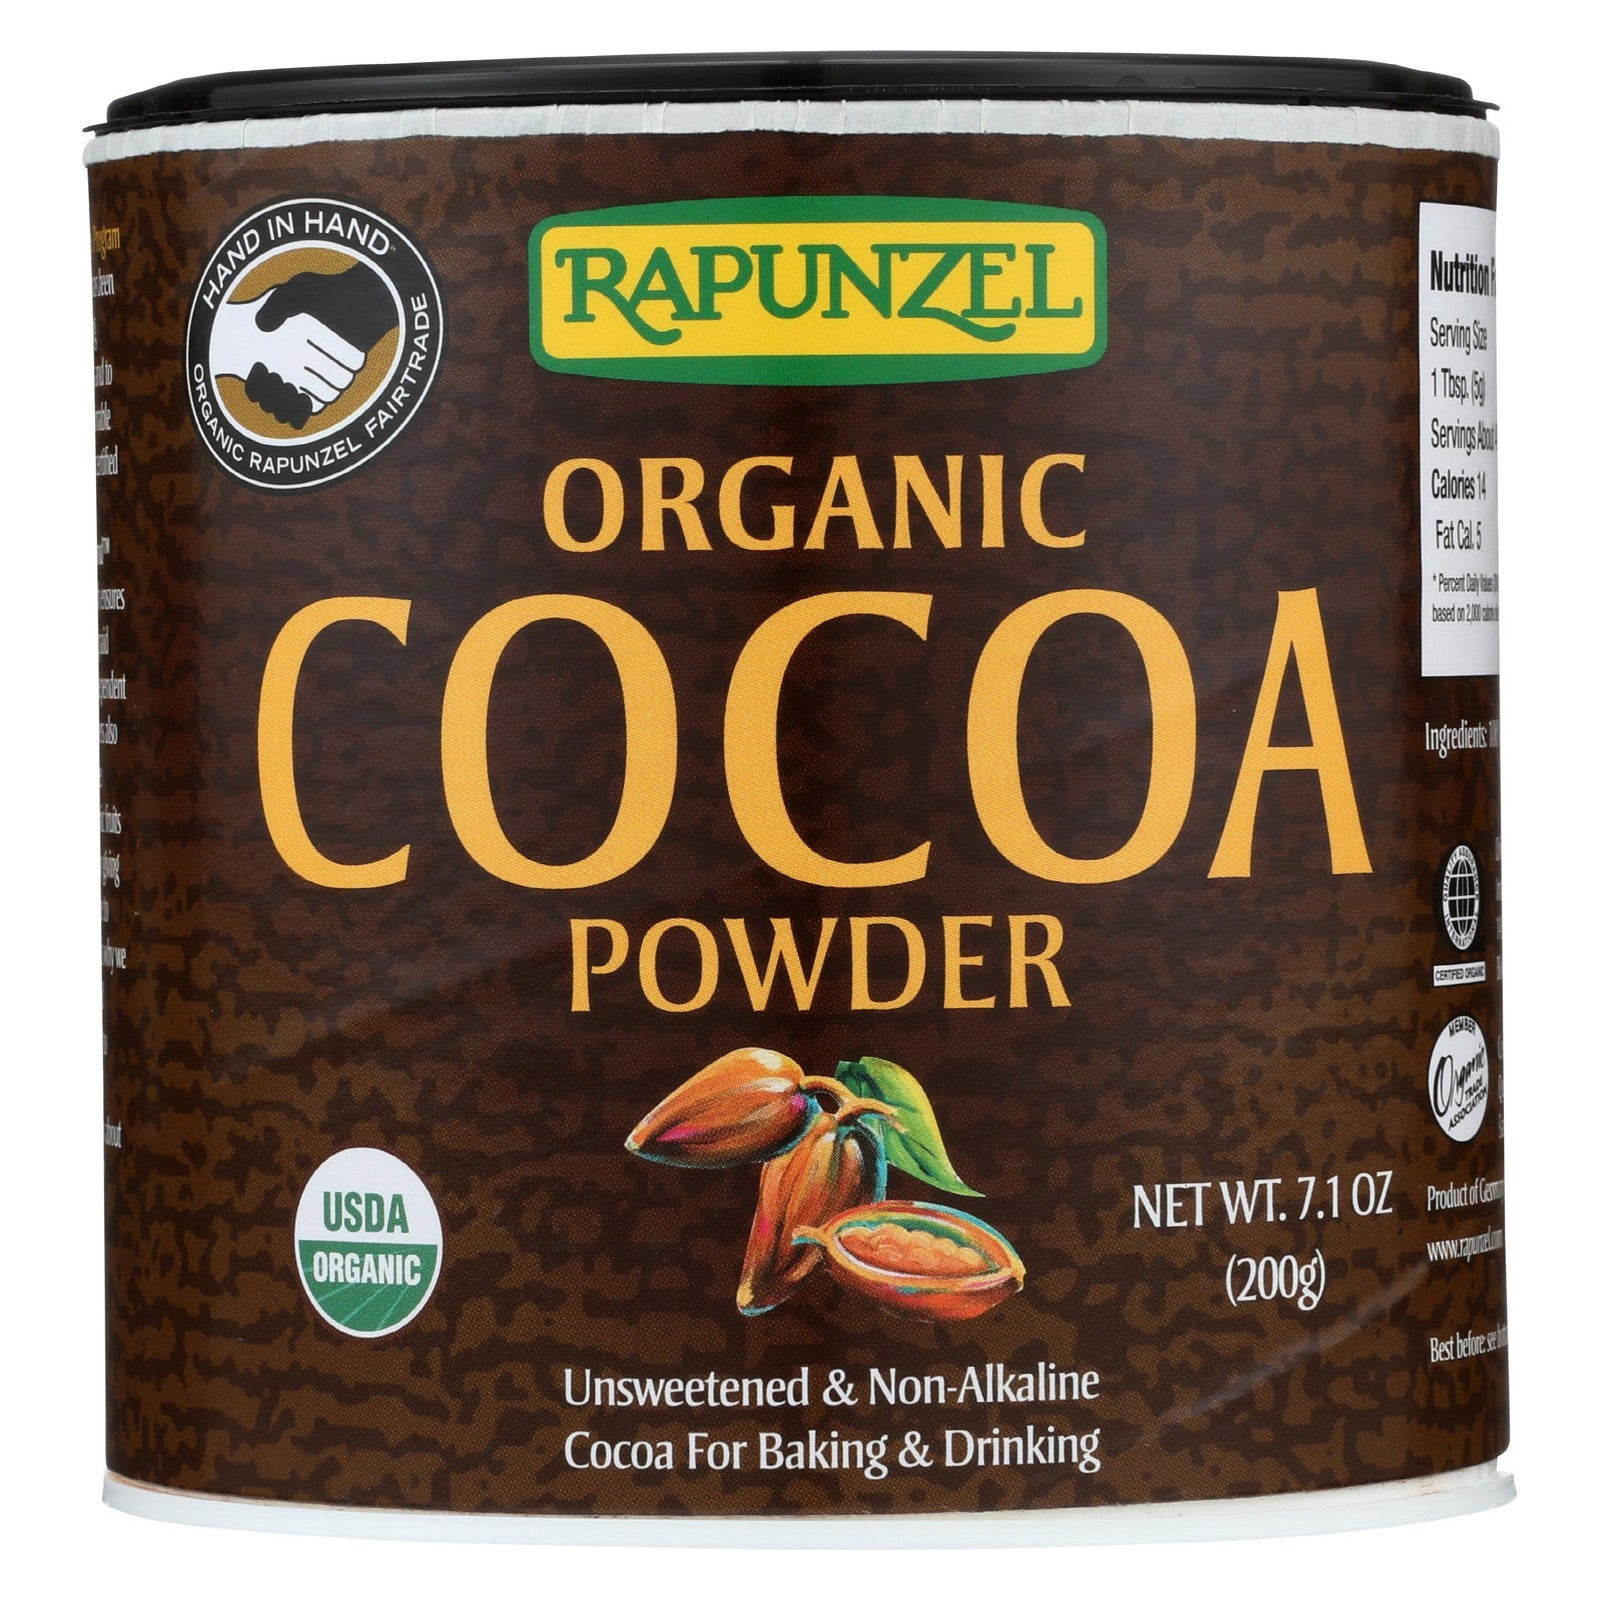 Rapunzel Organic Cocoa Powder - Case of 6 - 7.1 oz -  Overstock